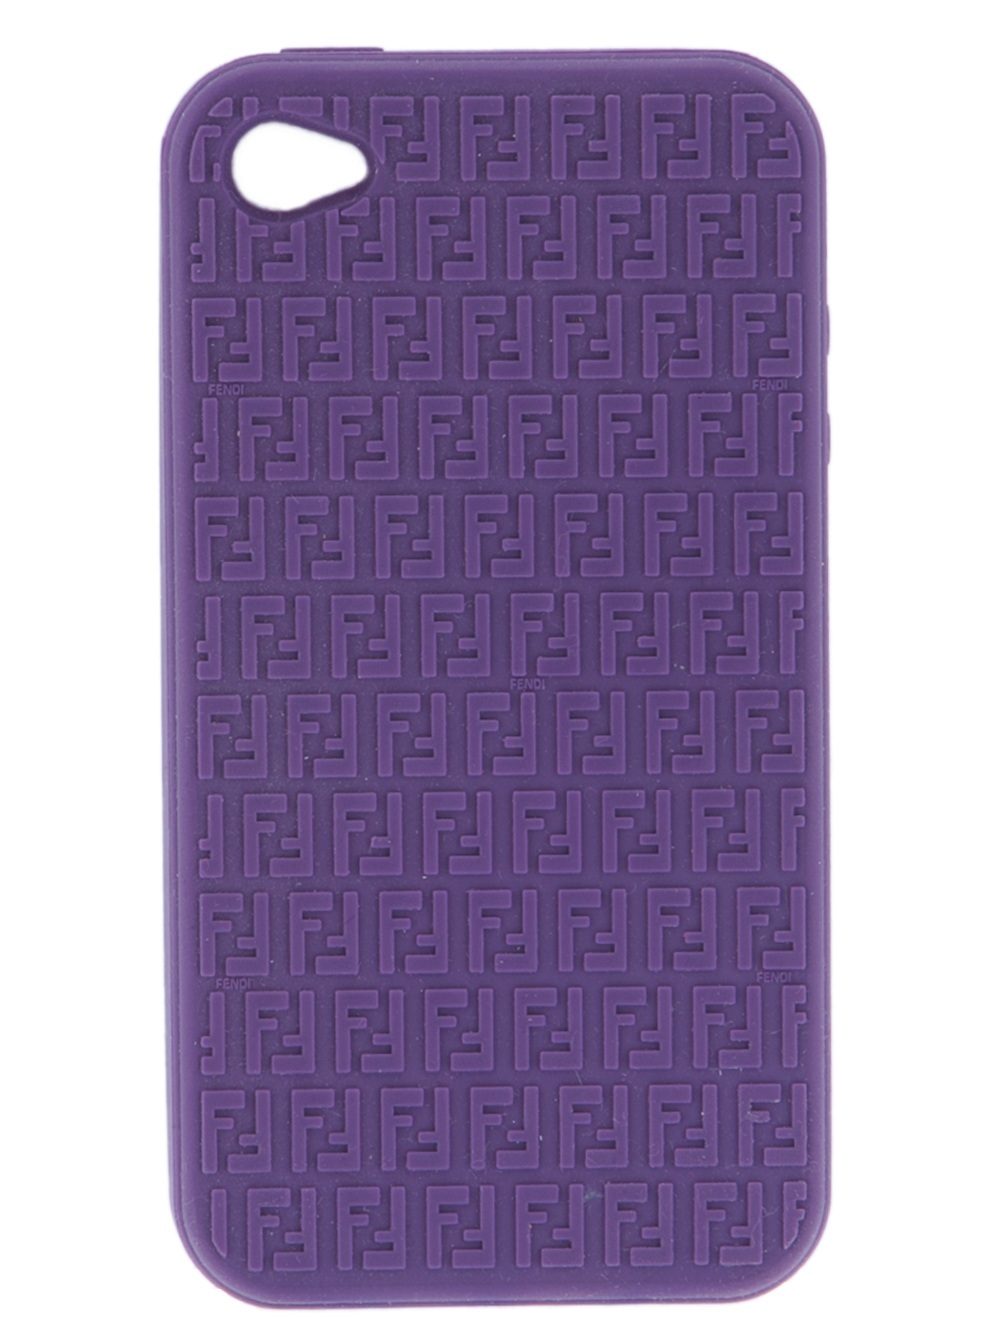 Monogram Iphone  Case Cheap